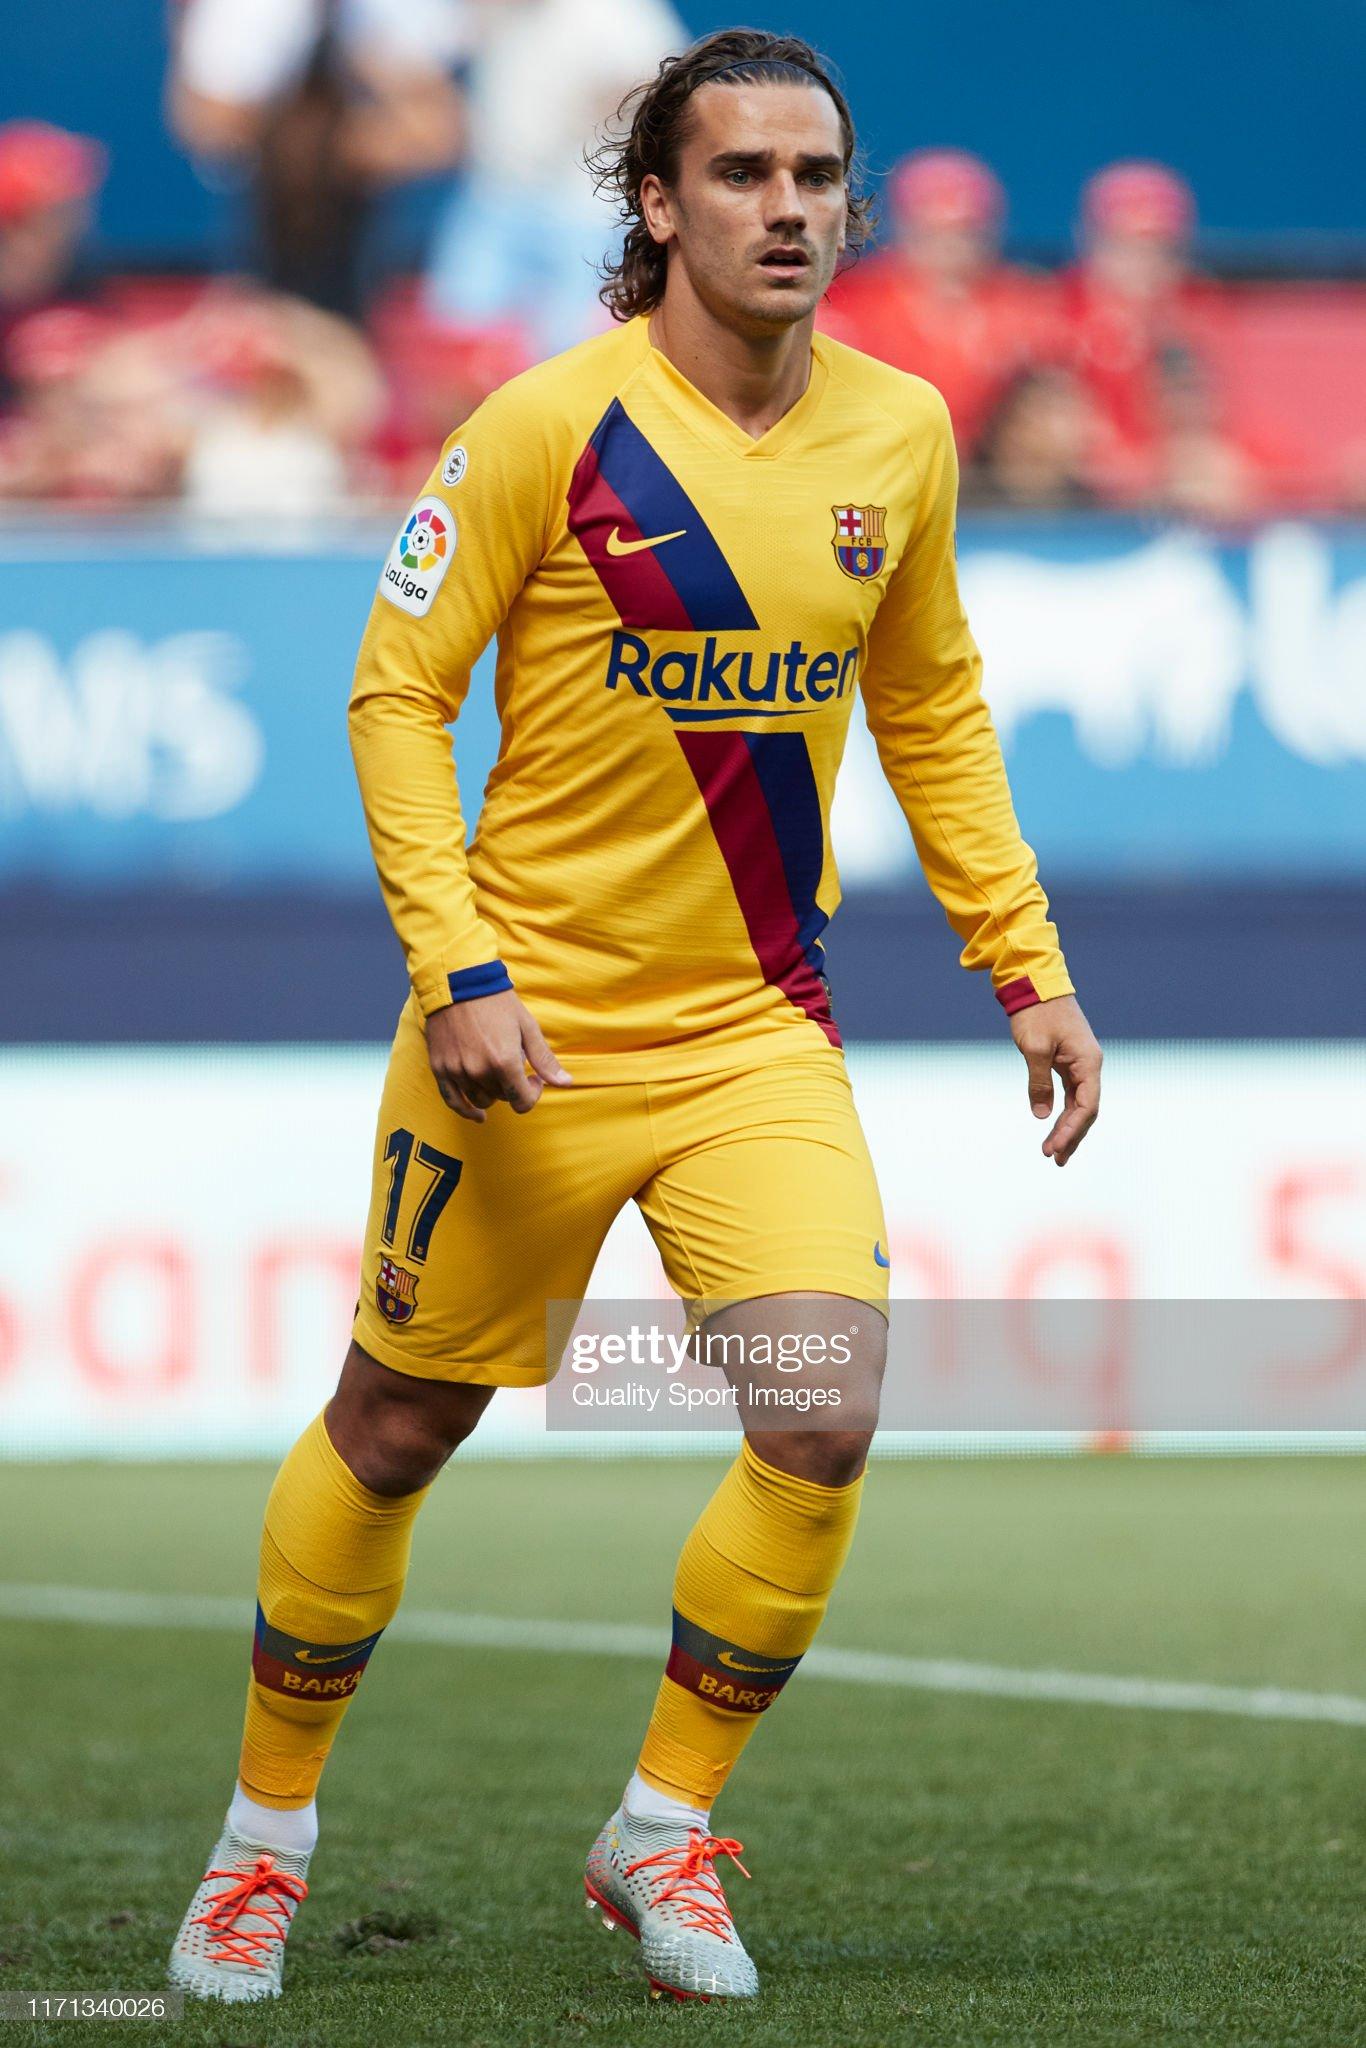 صور مباراة : أوساسونا - برشلونة 2-2 ( 31-08-2019 )  Antoine-griezmann-of-fc-barcelona-looks-on-during-the-liga-match-ca-picture-id1171340026?s=2048x2048